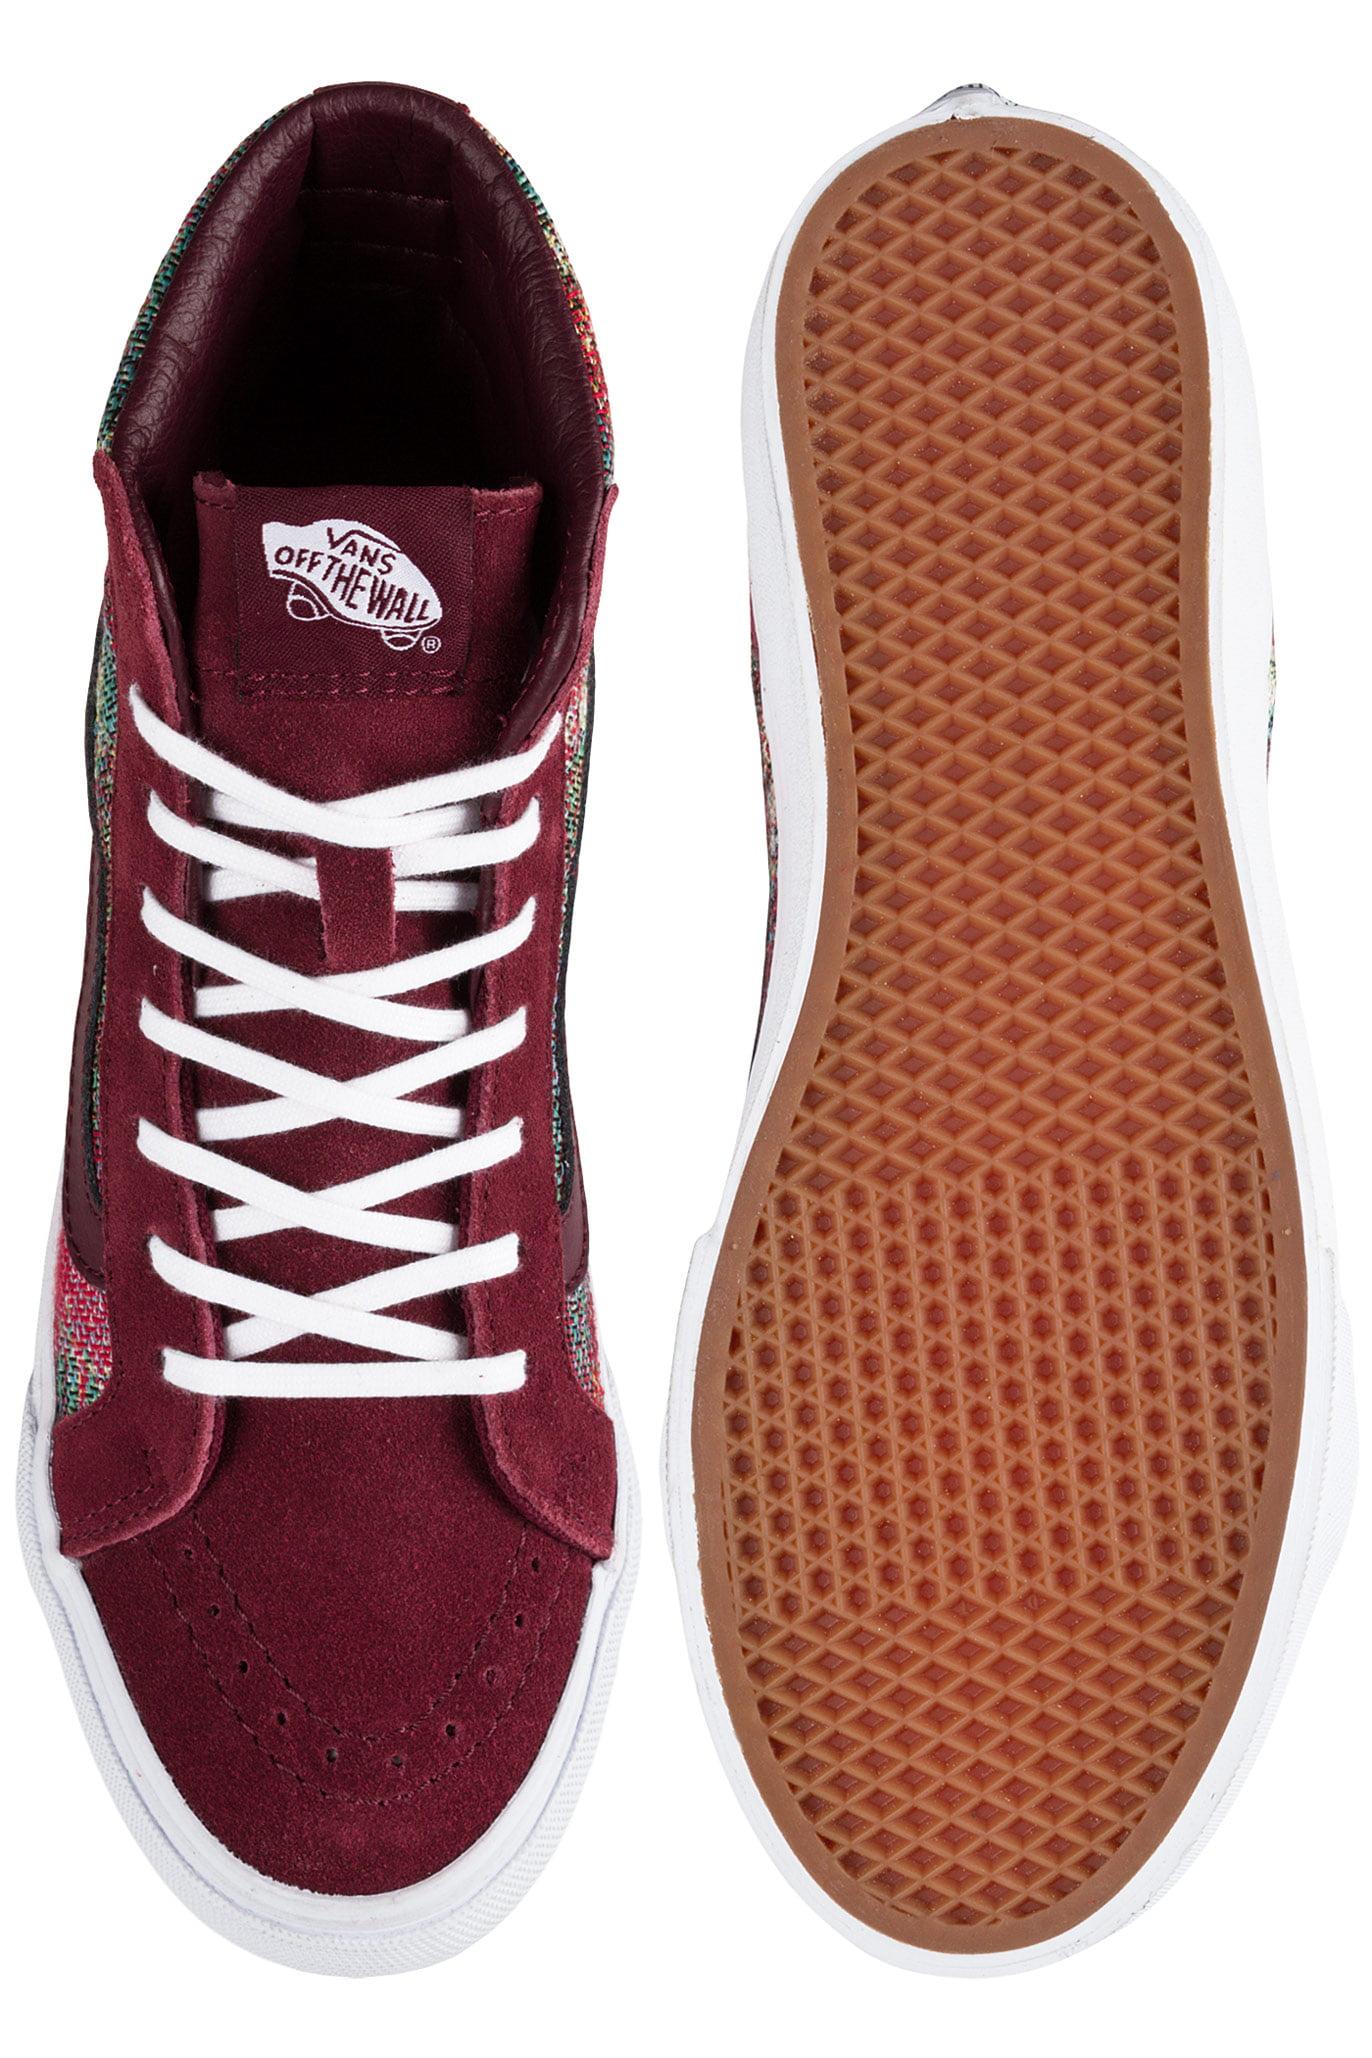 530206dac8 Vans - Vans Sk8-Hi Slim Italian Weave Port Royale Mid-Top Skateboarding Shoe  - 8.5M   7M - Walmart.com